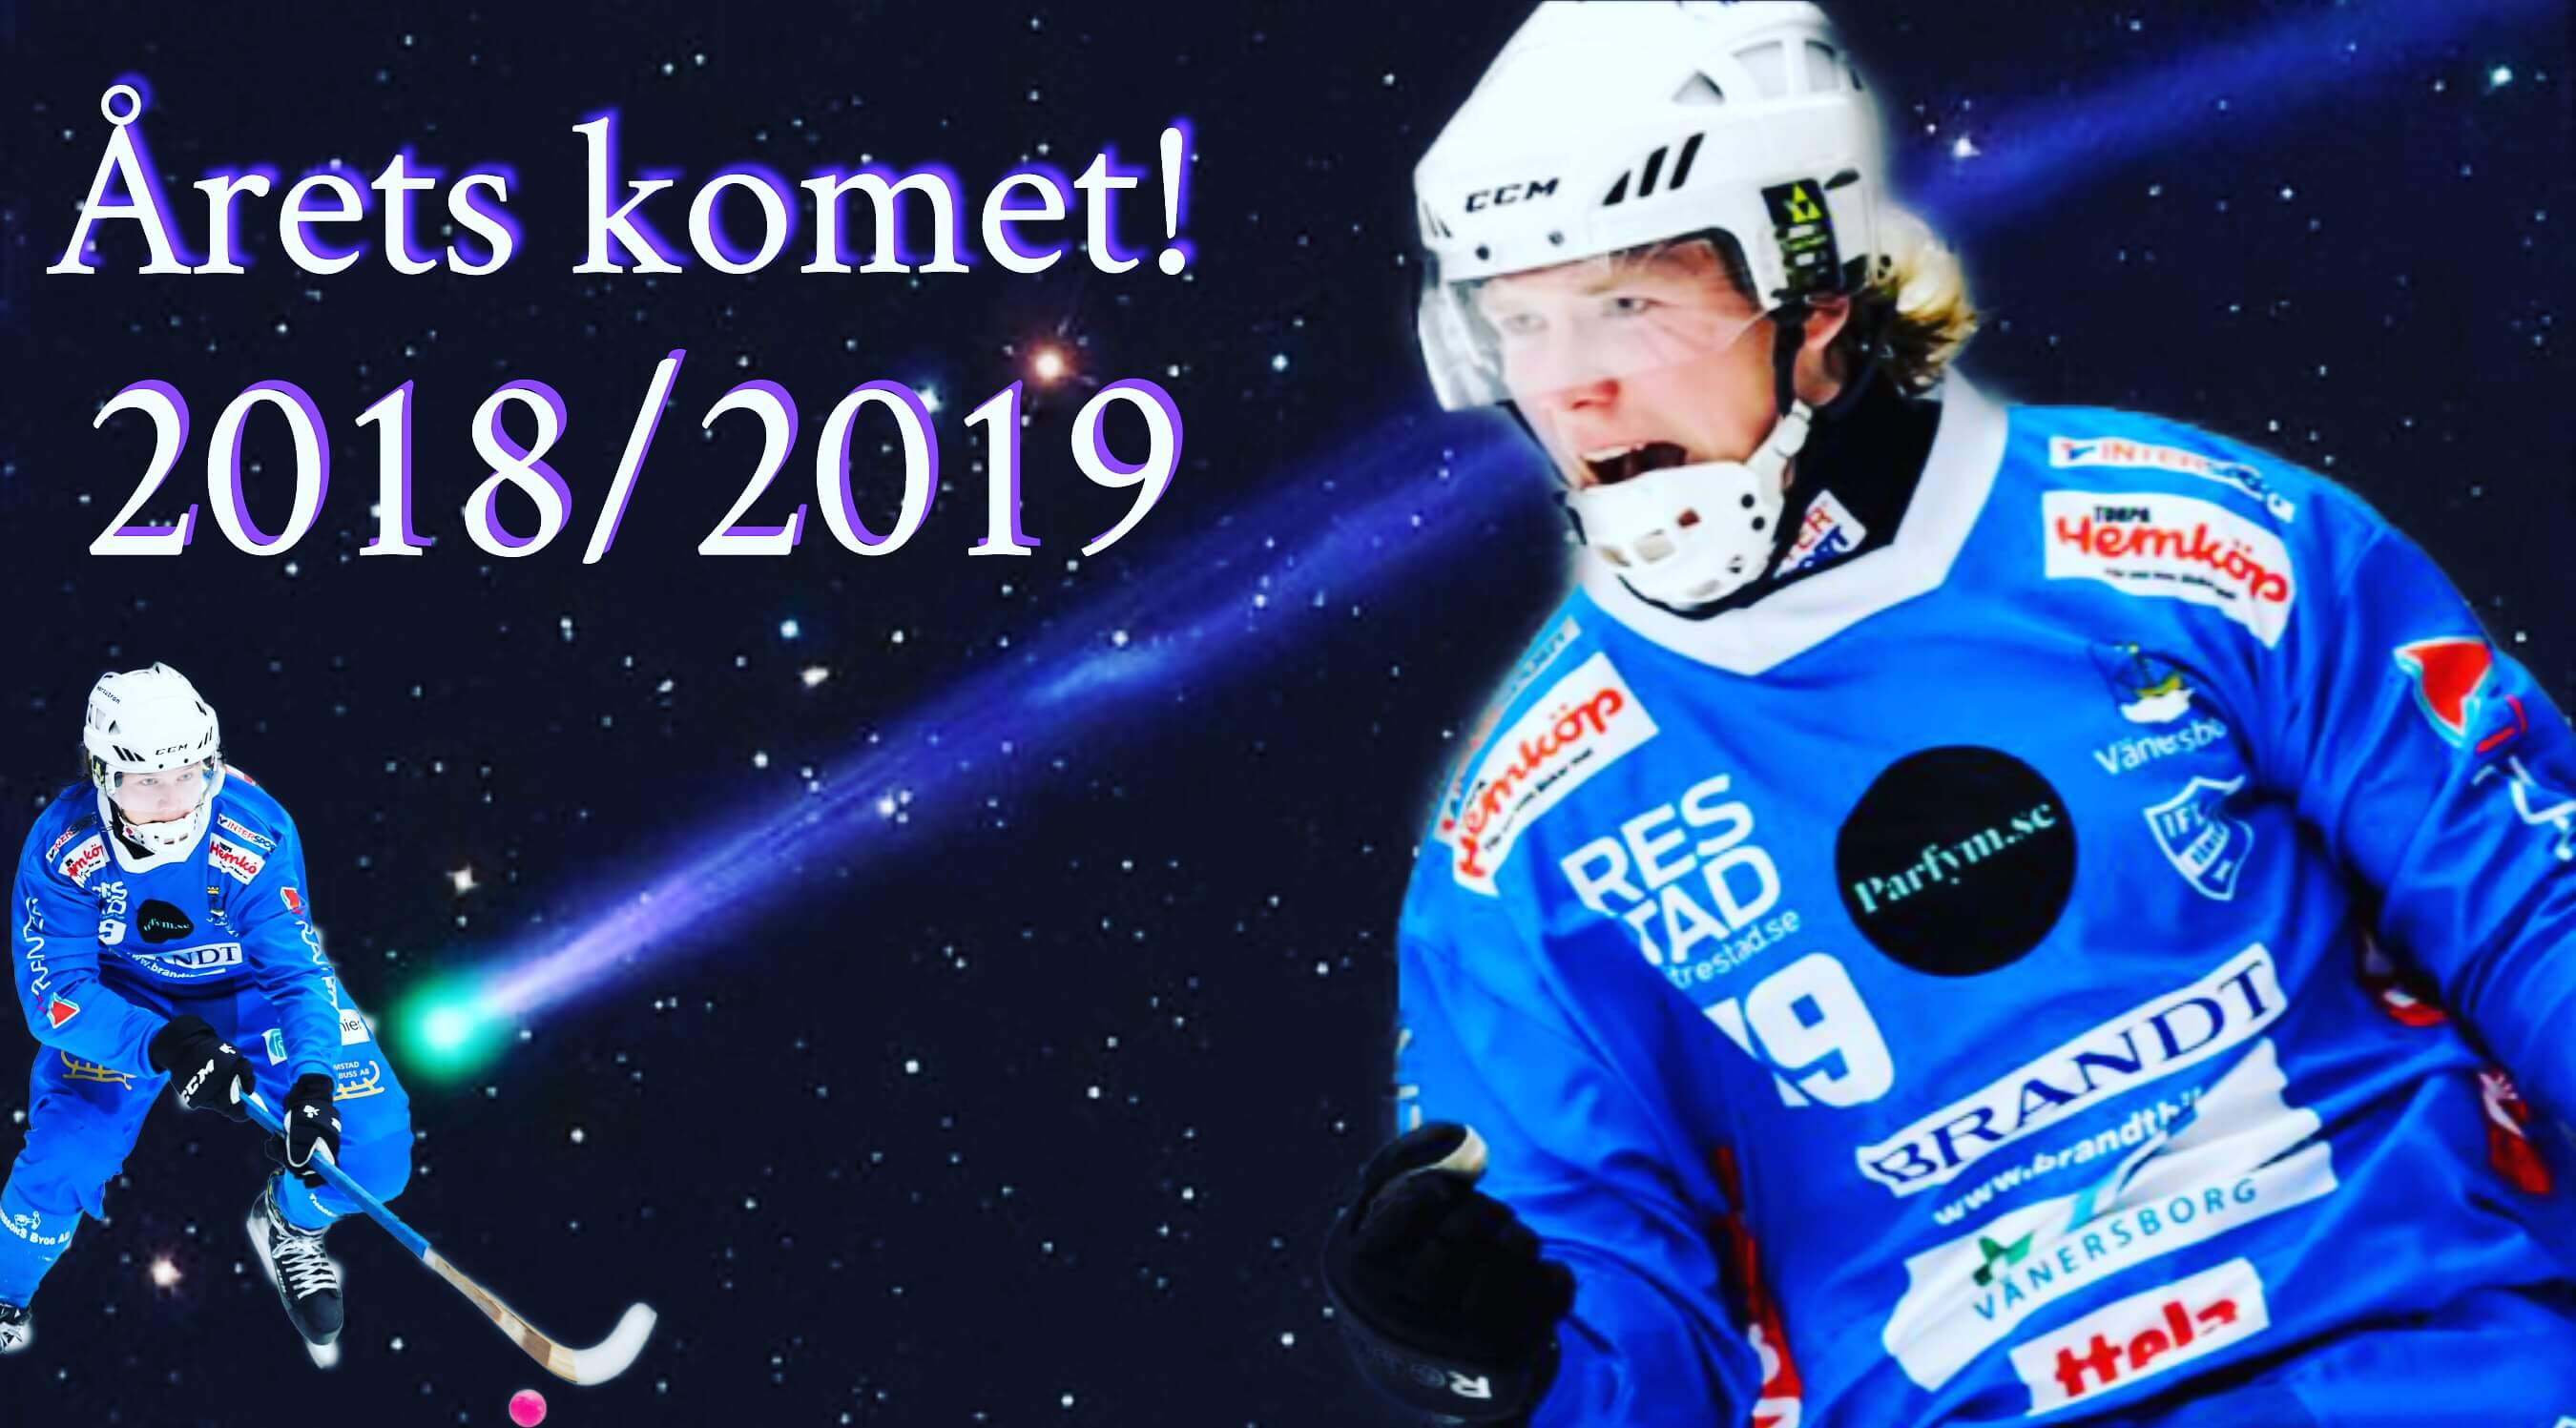 Robin Öhrlund årets komet